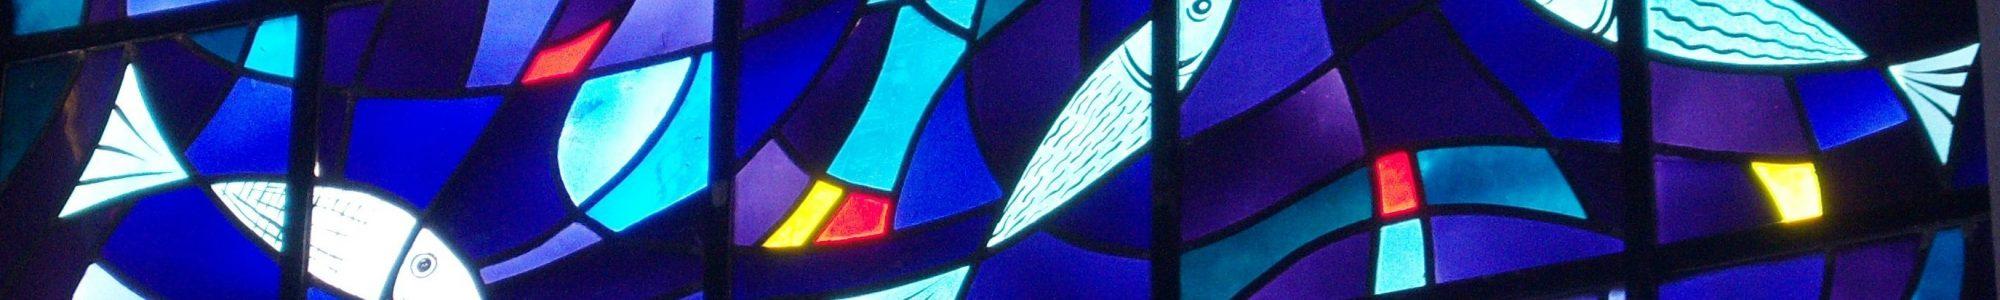 pixhere-fish-window-cropped.jpg